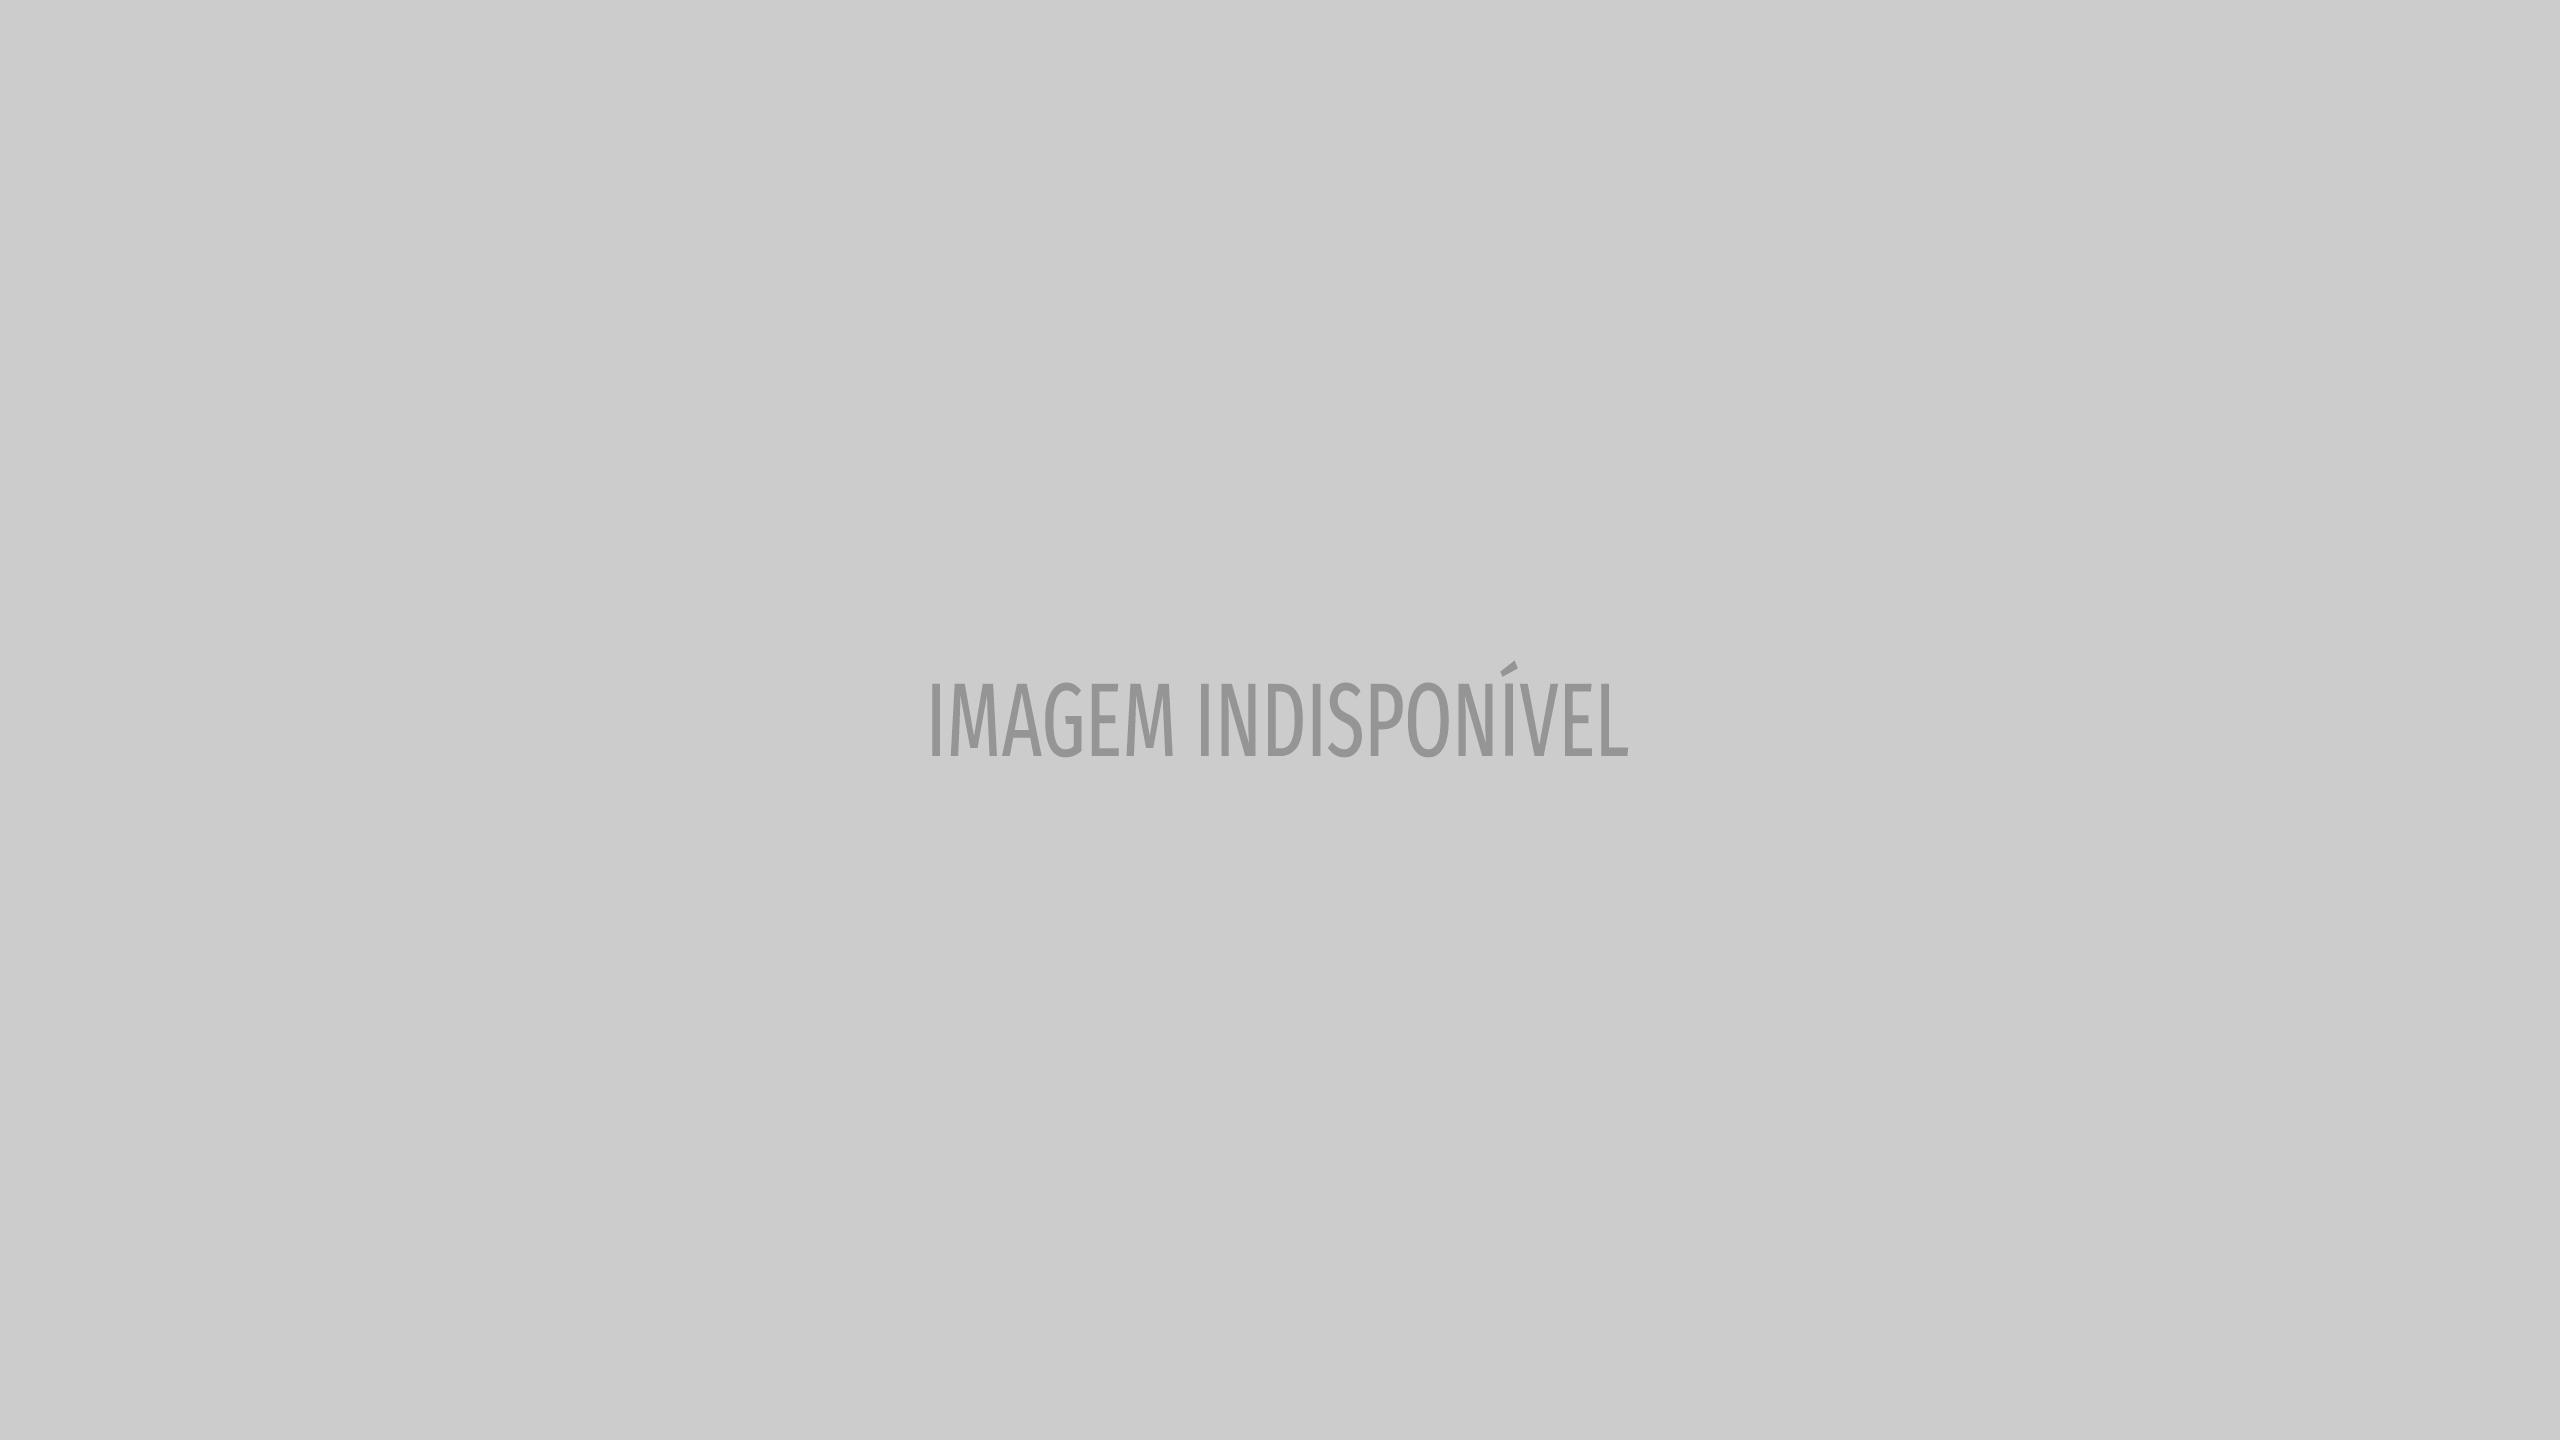 Impressionante tromba de água surpreende Ilha grega